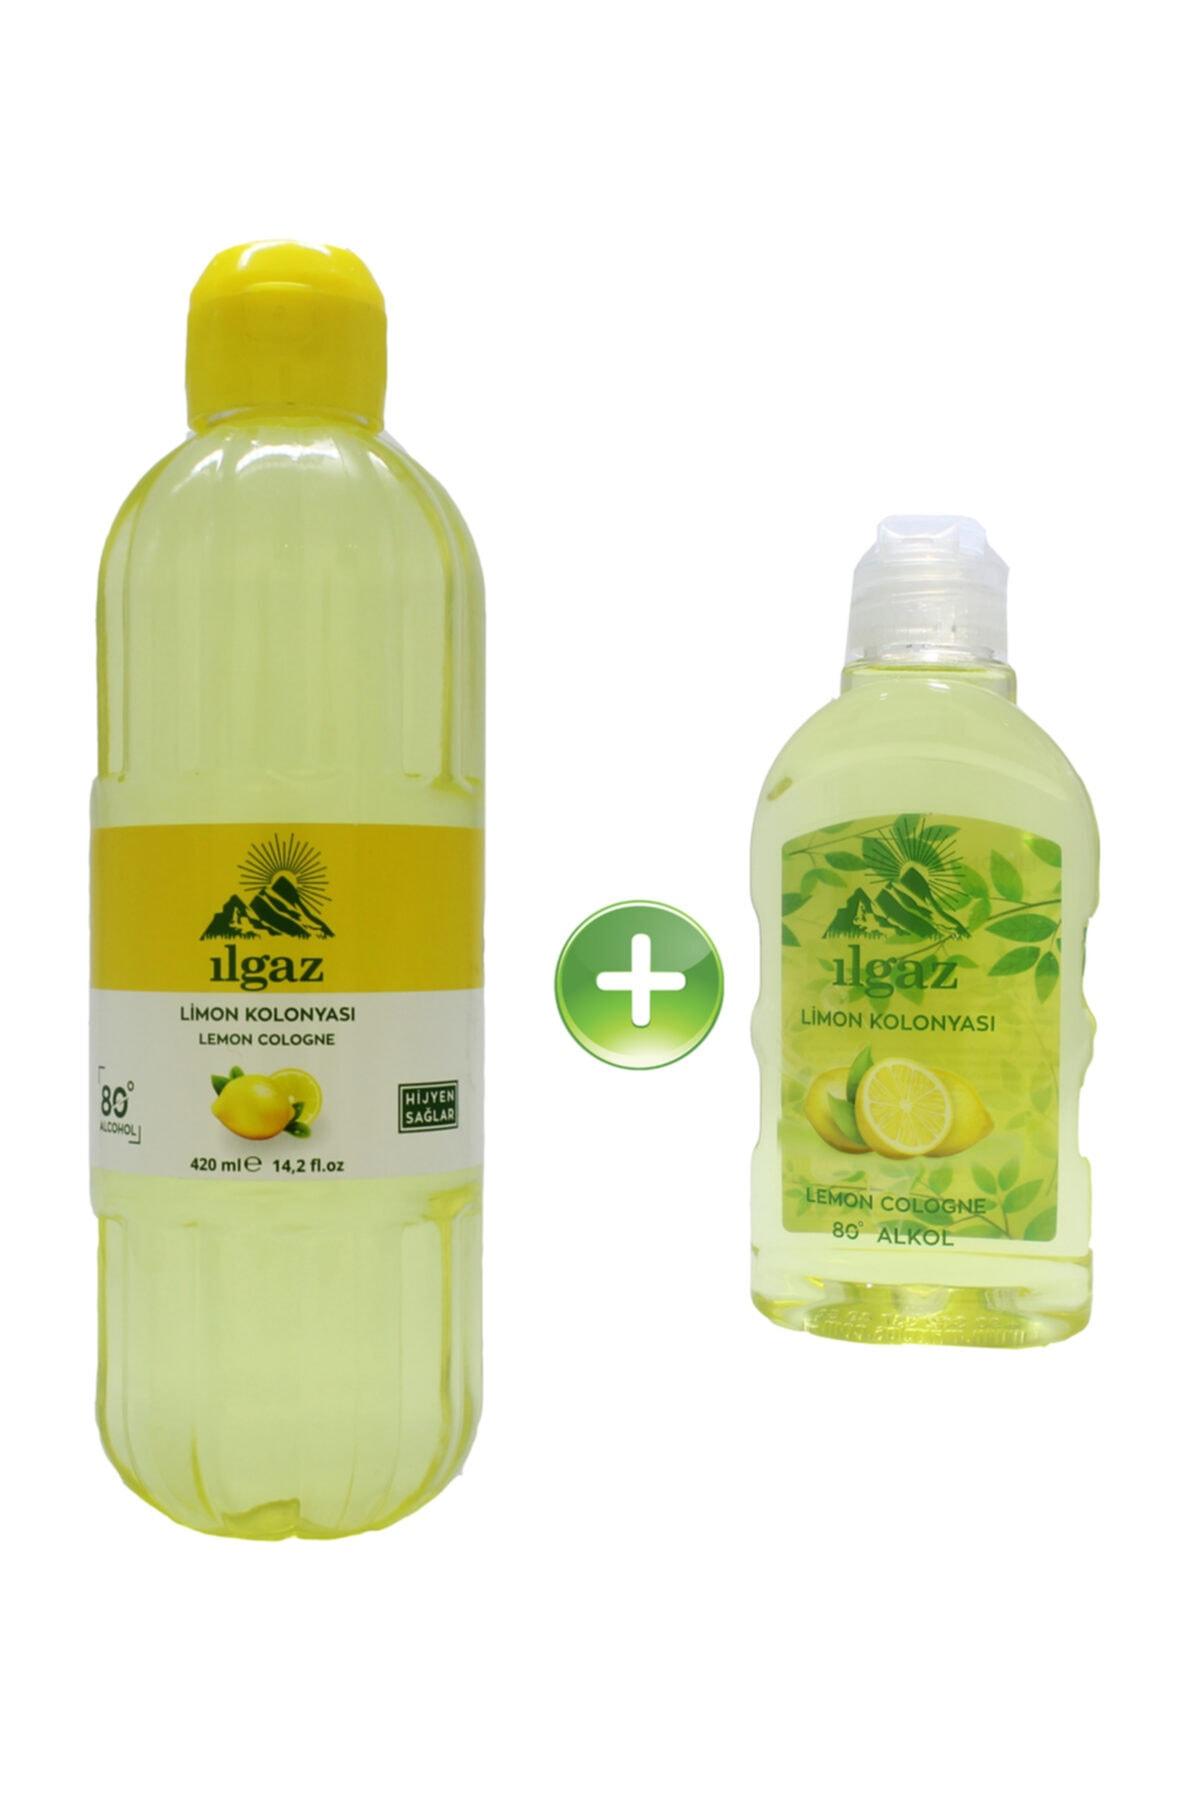 ILGAZ Limon Kolonyası 420 Ml + 225 Ml Ikili 80 Derece Kolonya Eau De Cologne 1